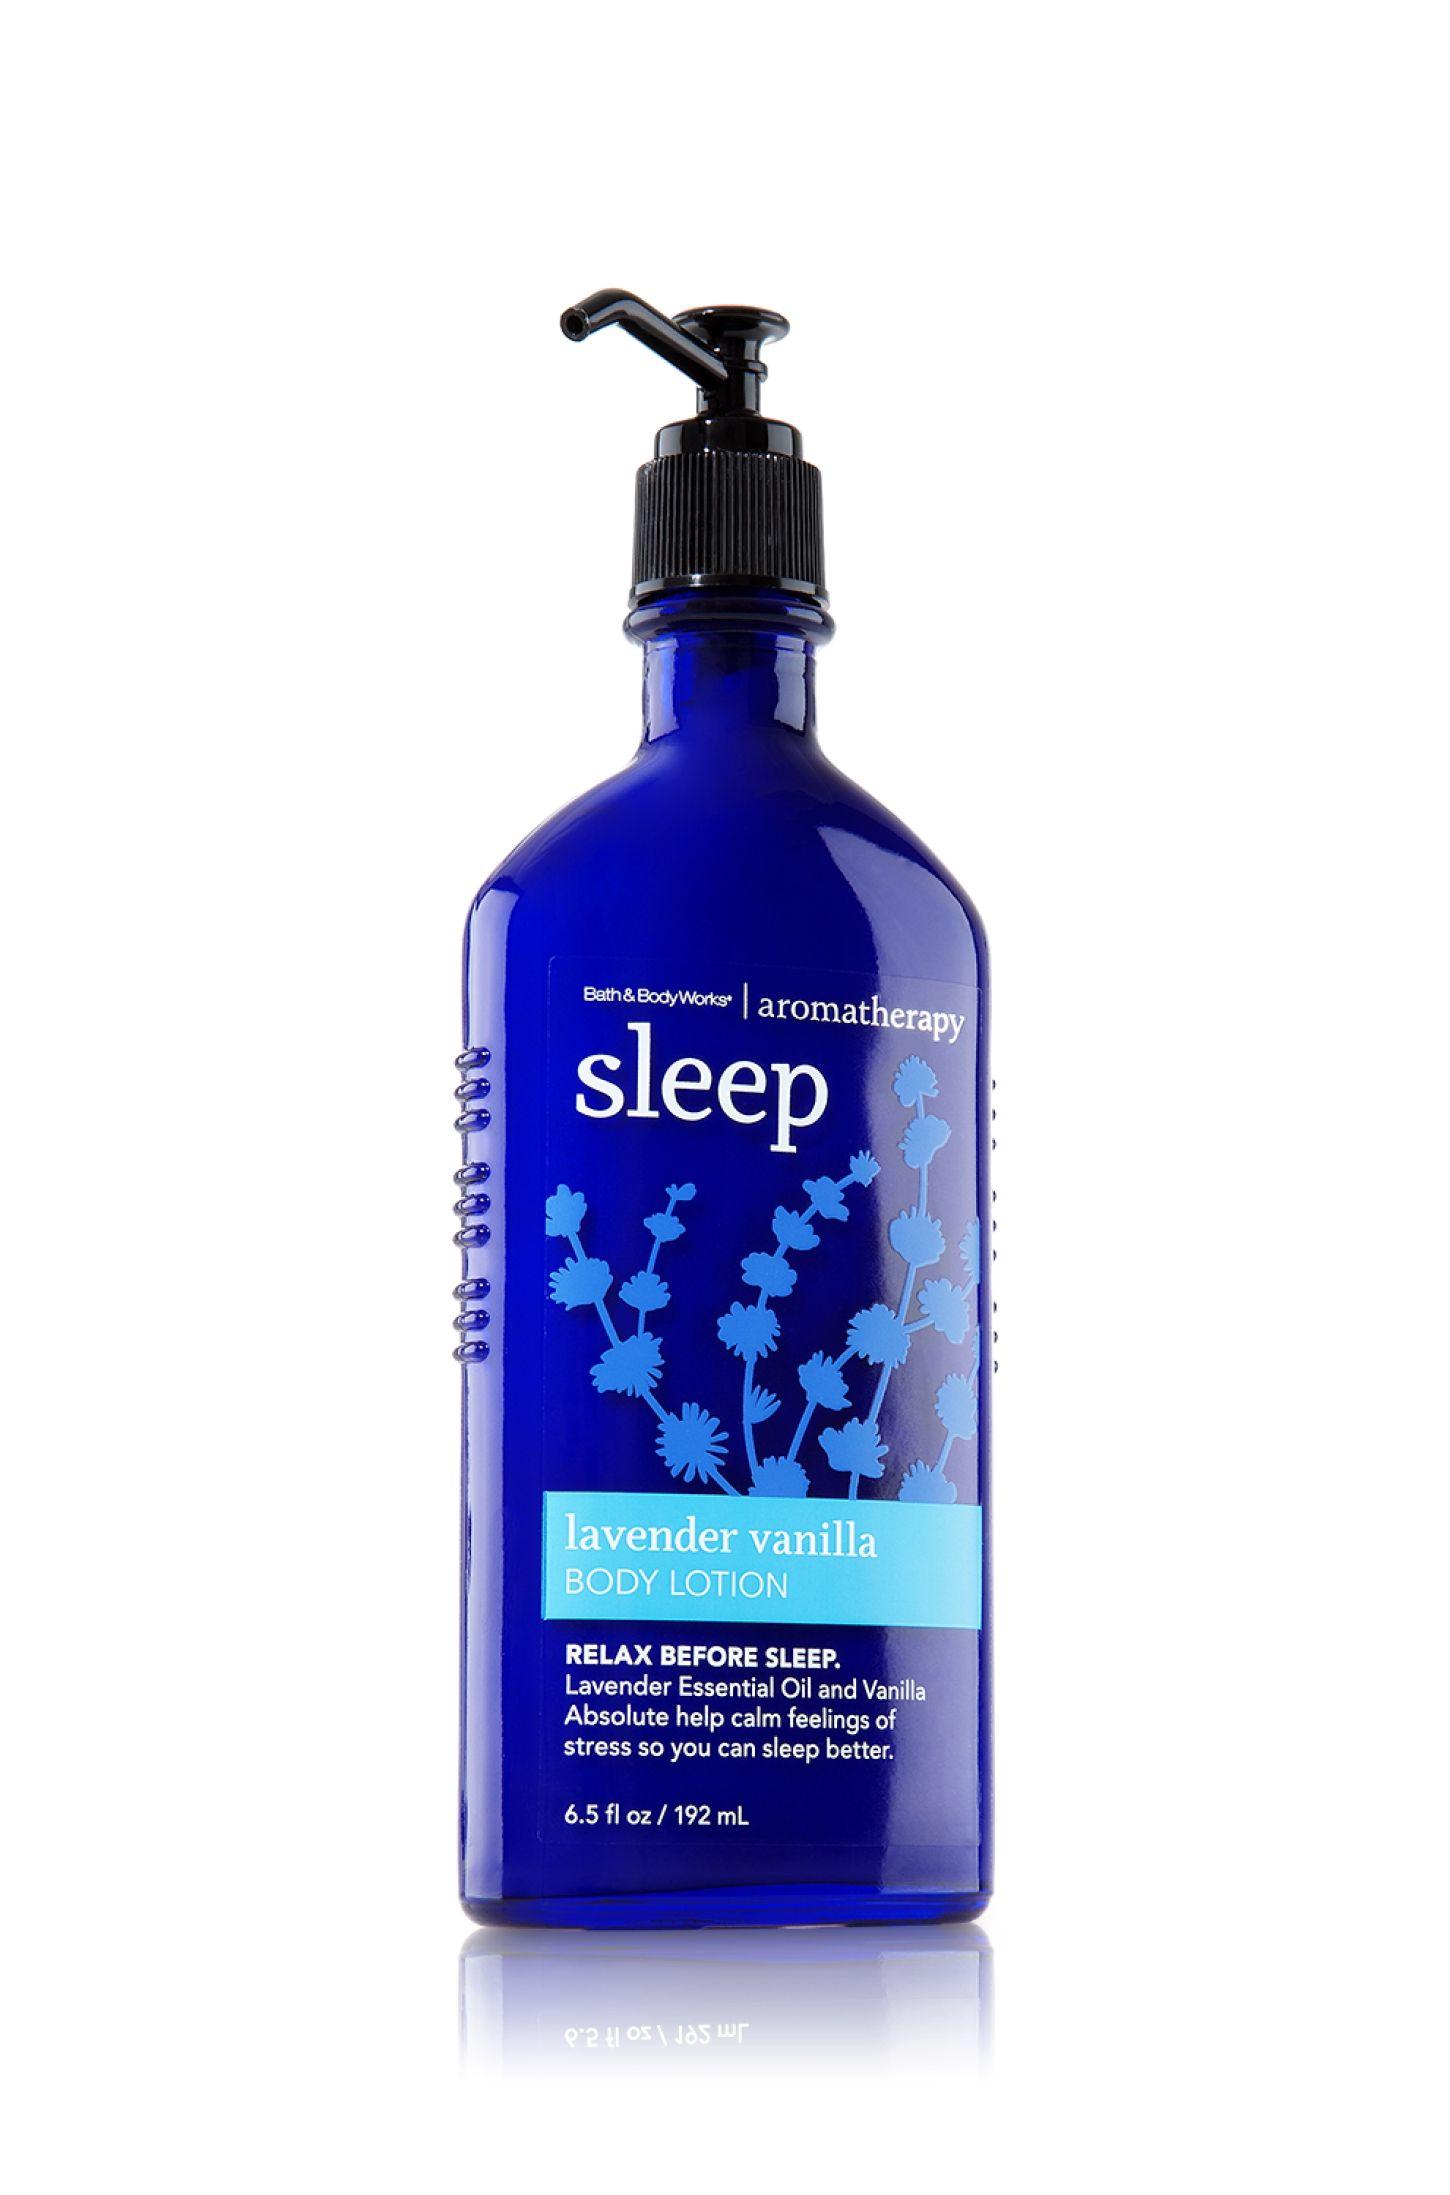 Sleep Lavender Vanilla Body Lotion Aromatherapy Bath